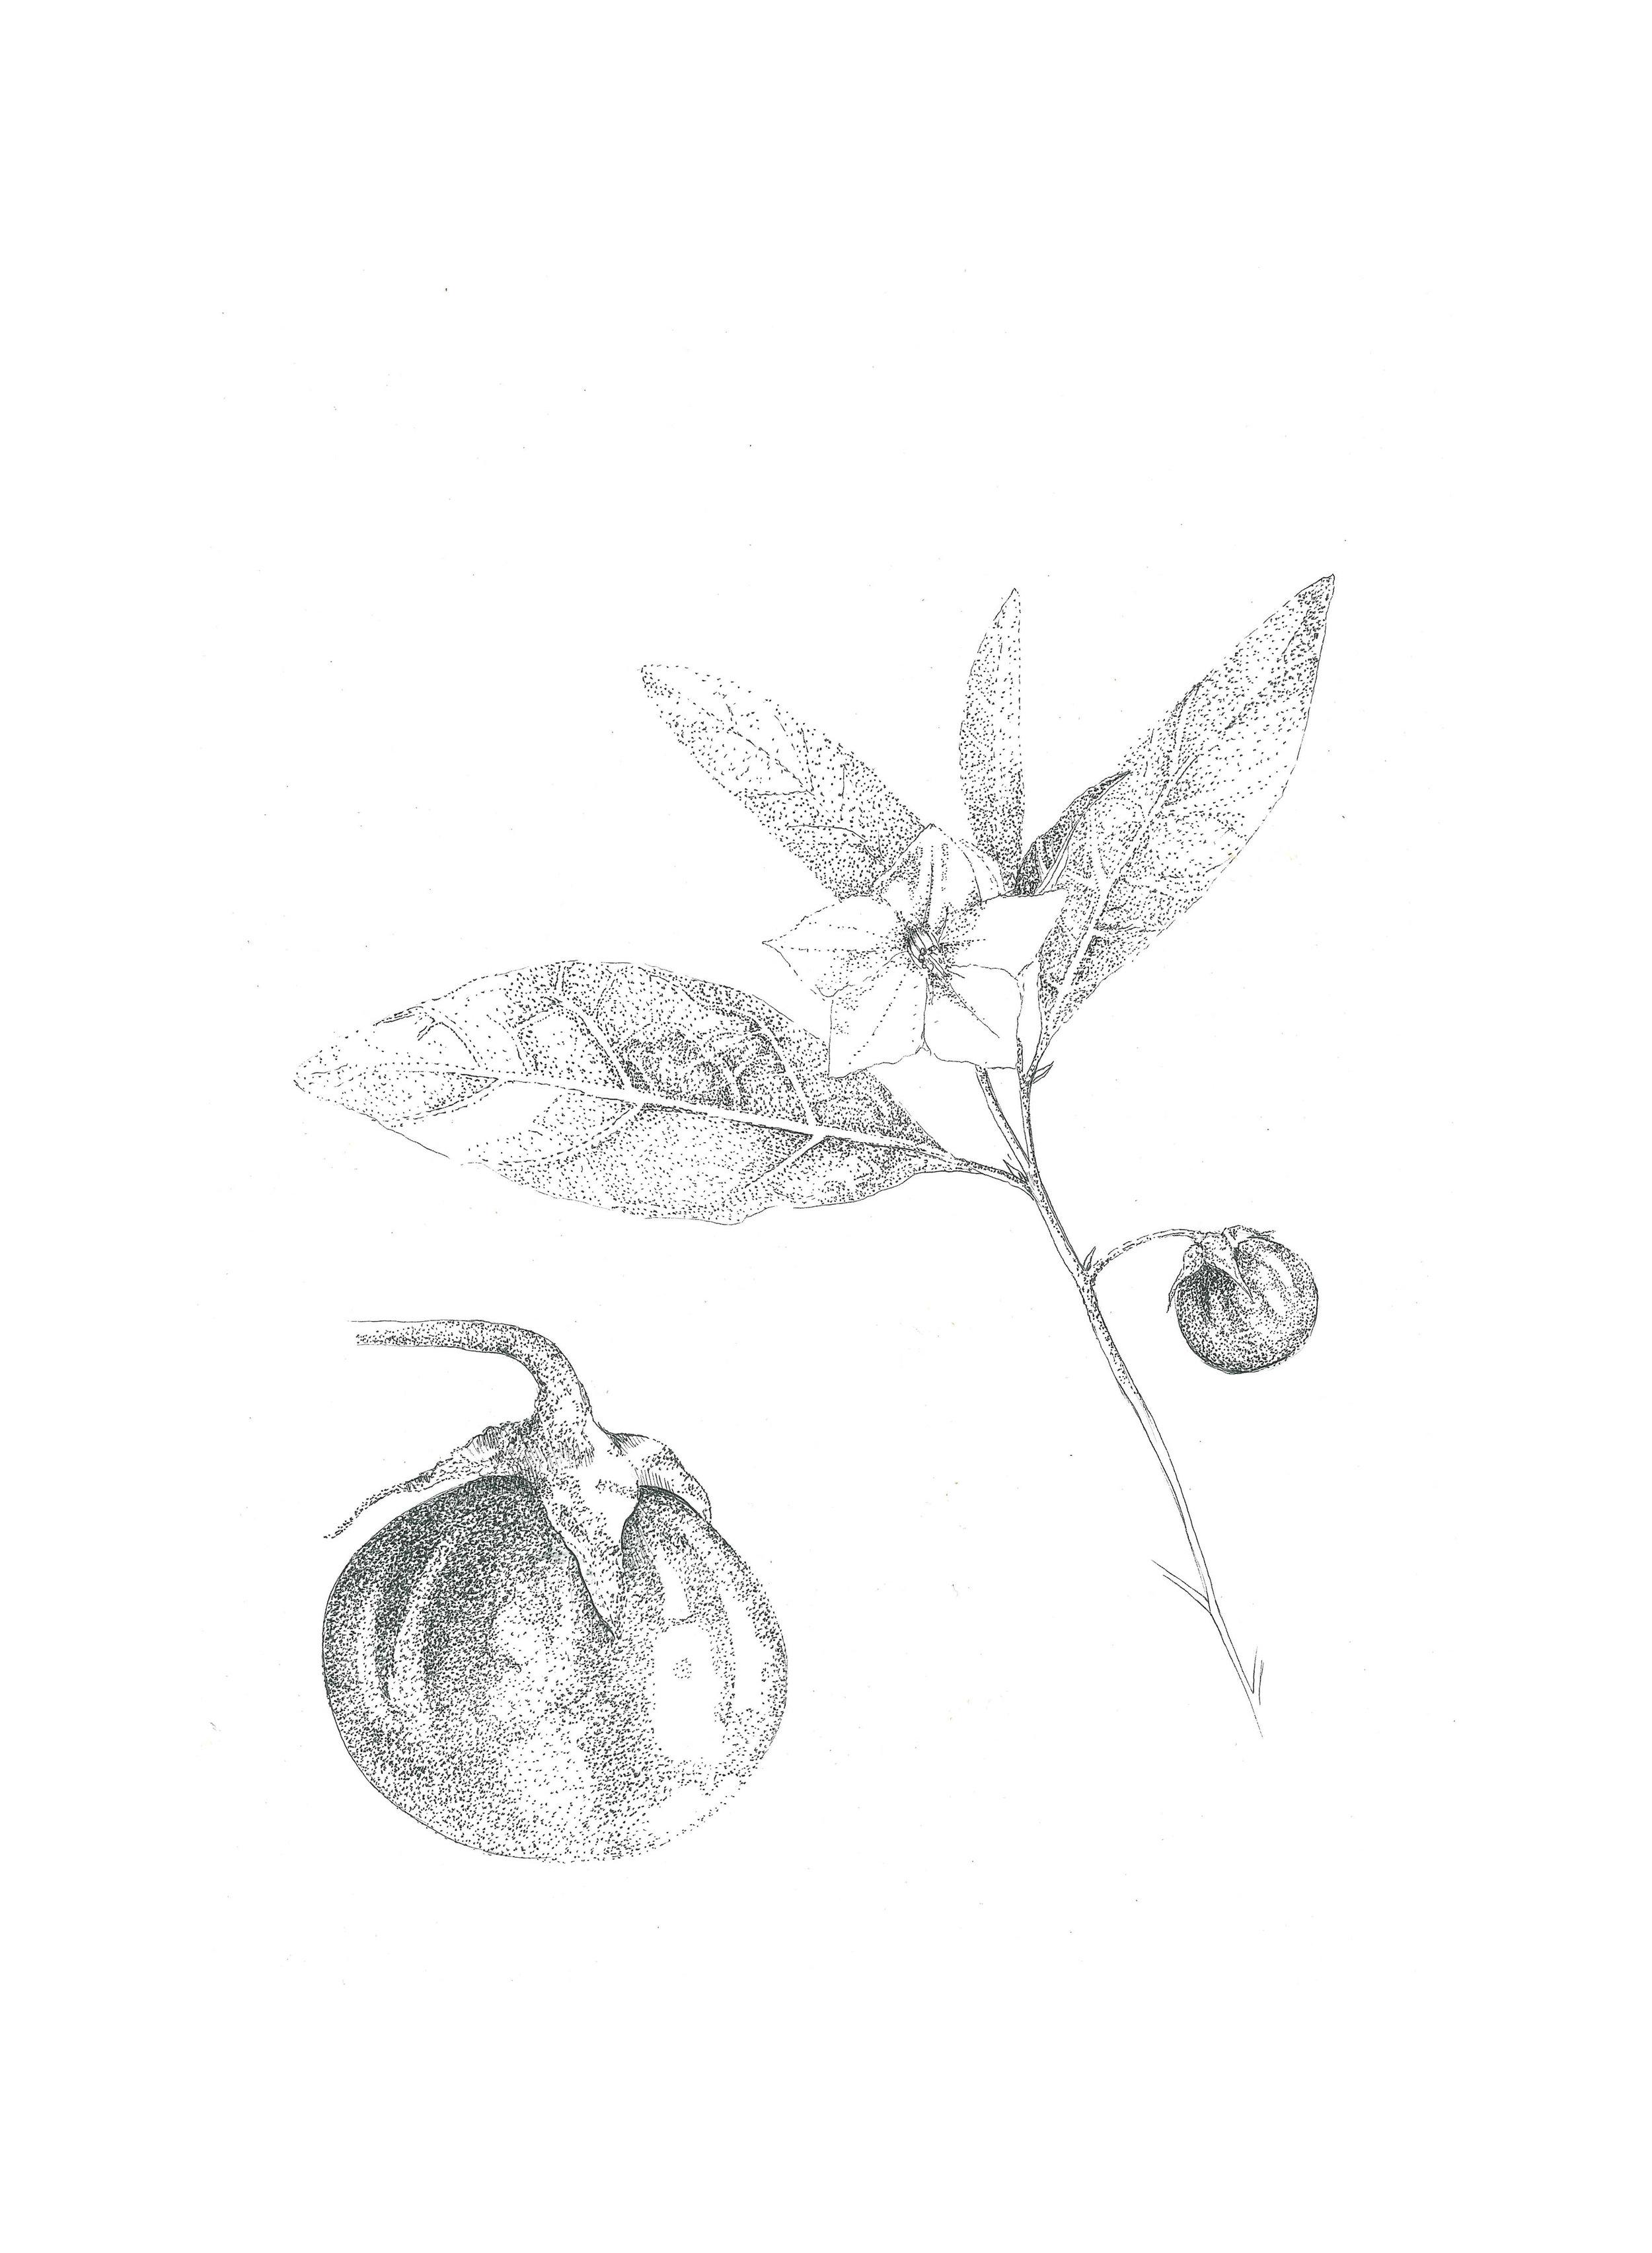 Solanum panduryorme (Poison Apple)